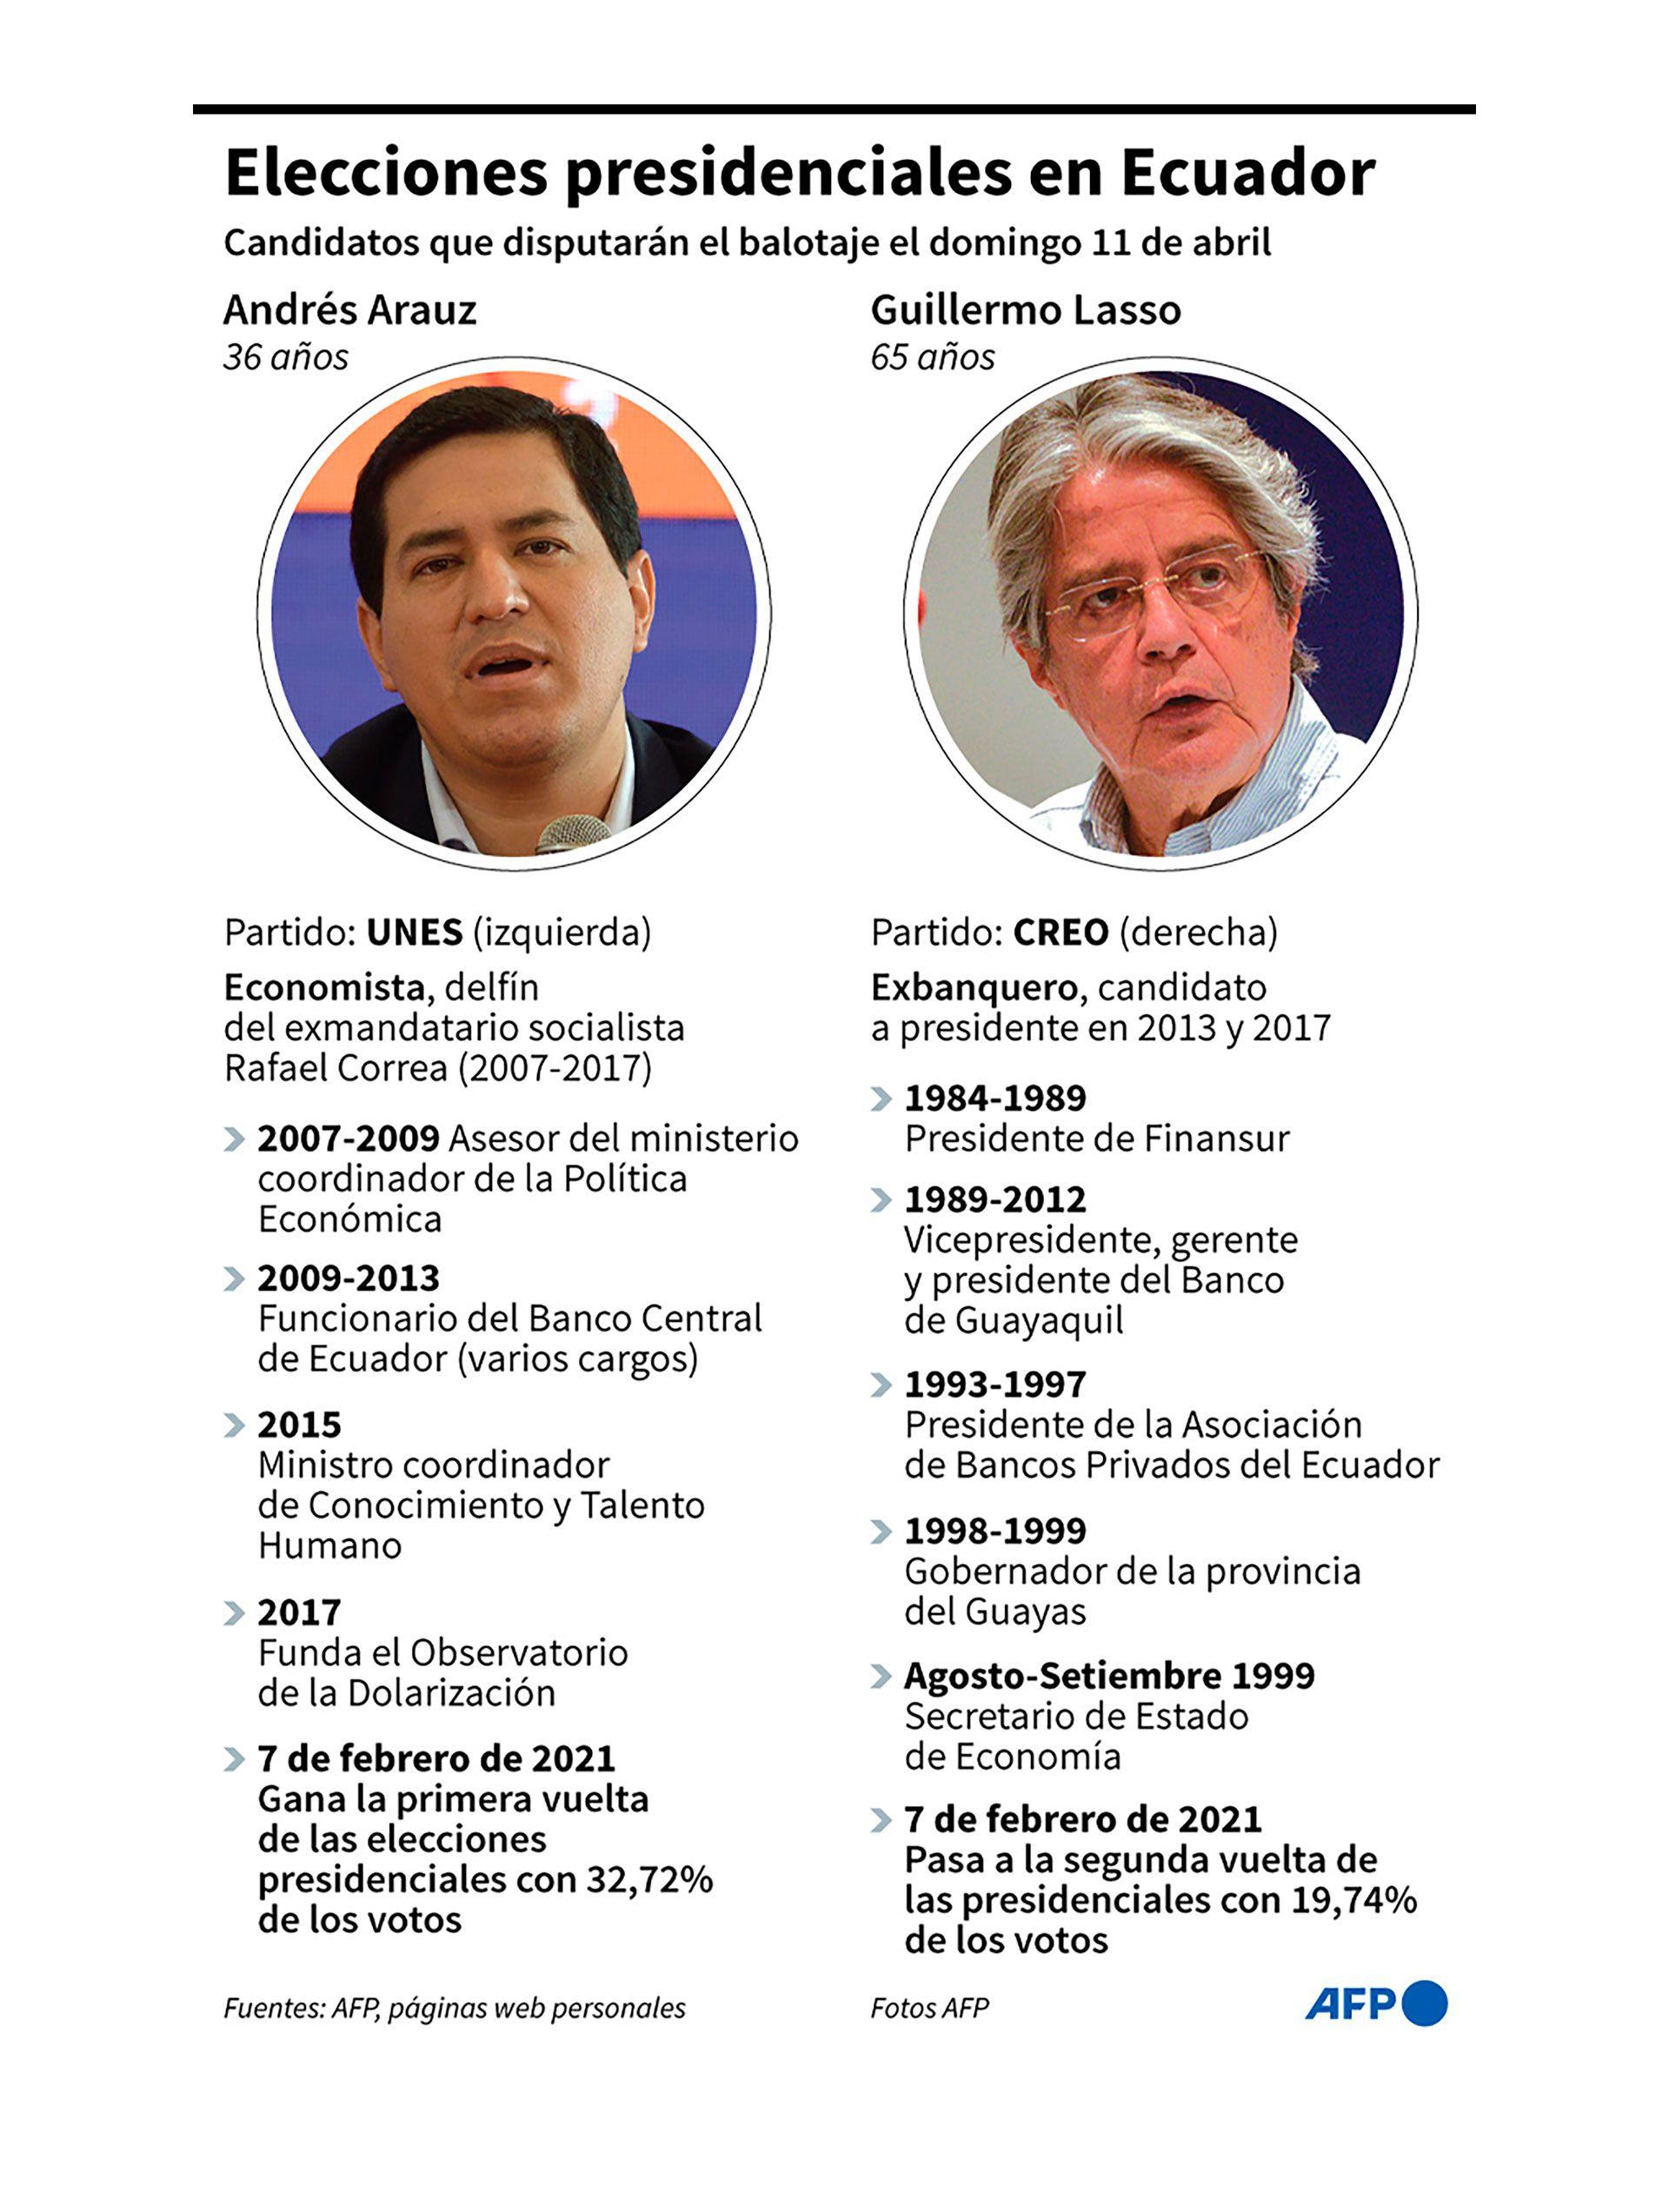 Infografia-elecciones-Ecuador